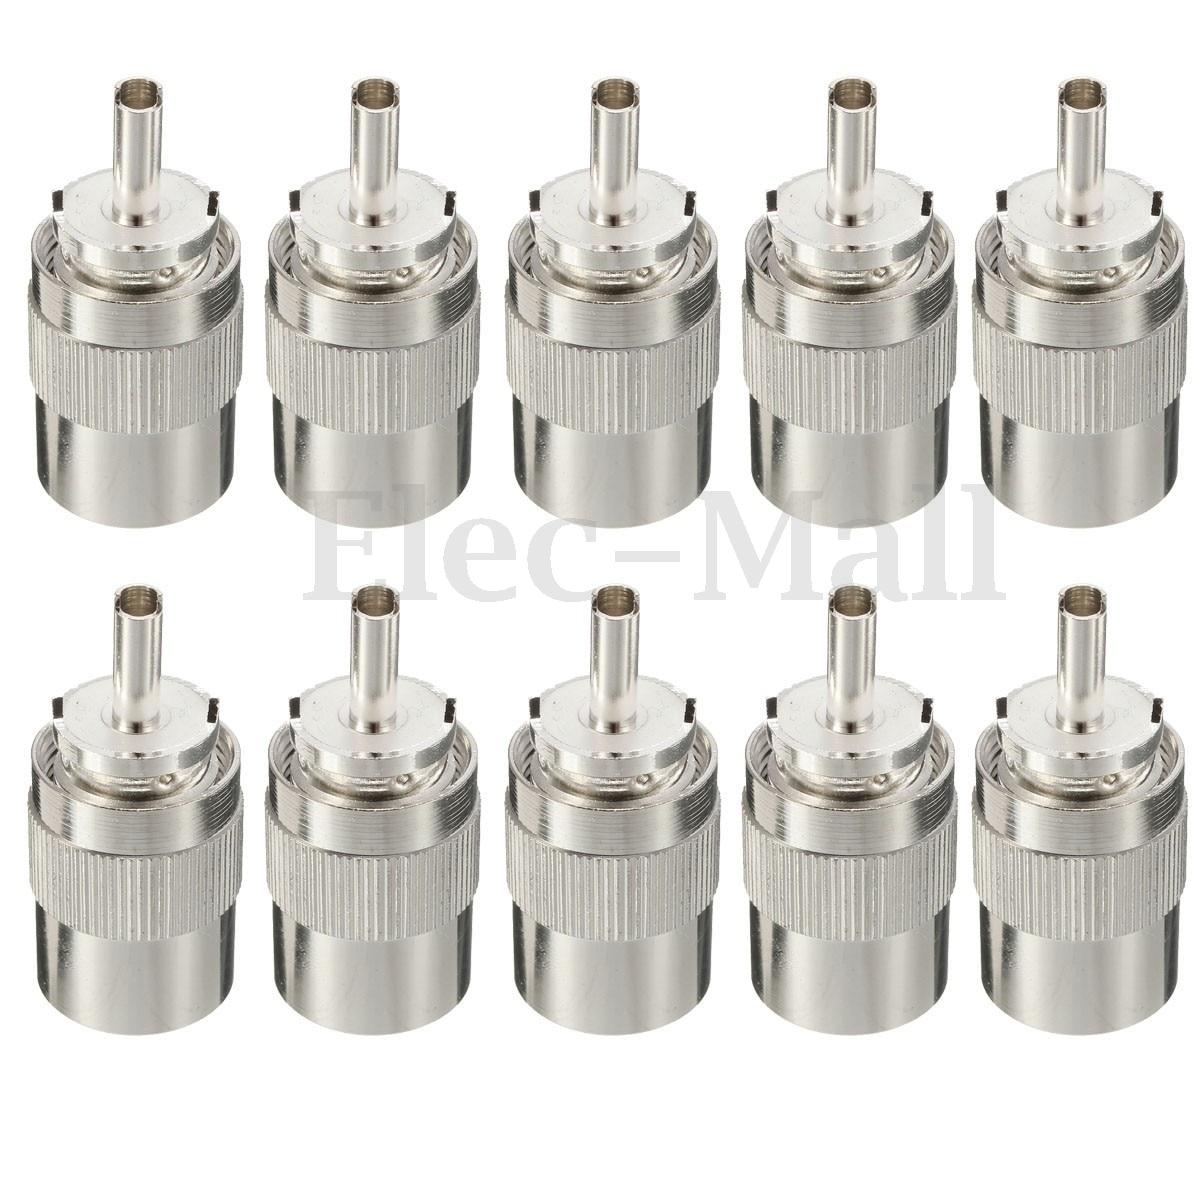 10pcs Connector UHF male PL259 plug solder RG8 RG213 LMR400 7D-FB cable silver samsung digimax pl 10 silver